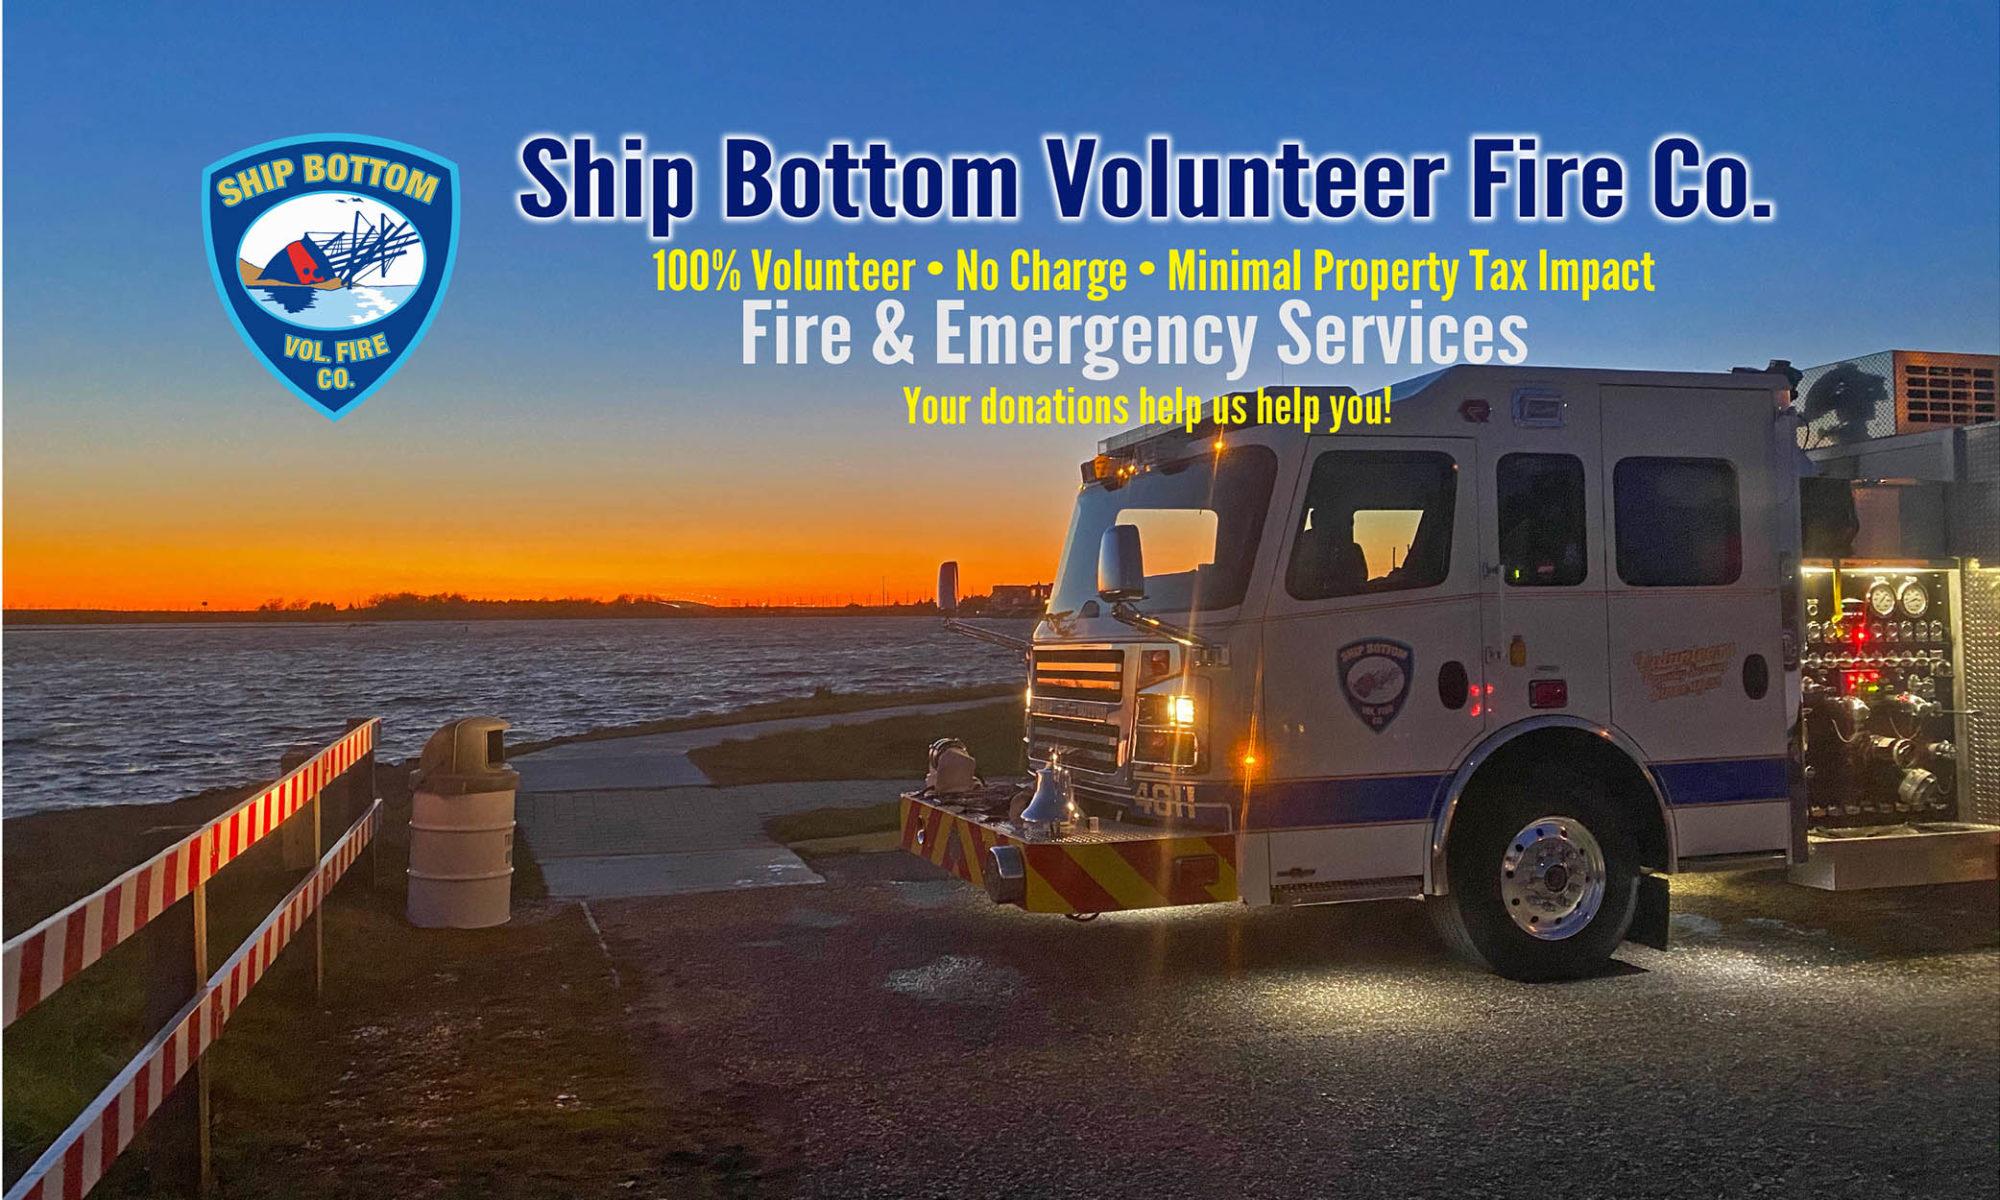 Ship Bottom Volunteer Fire Co